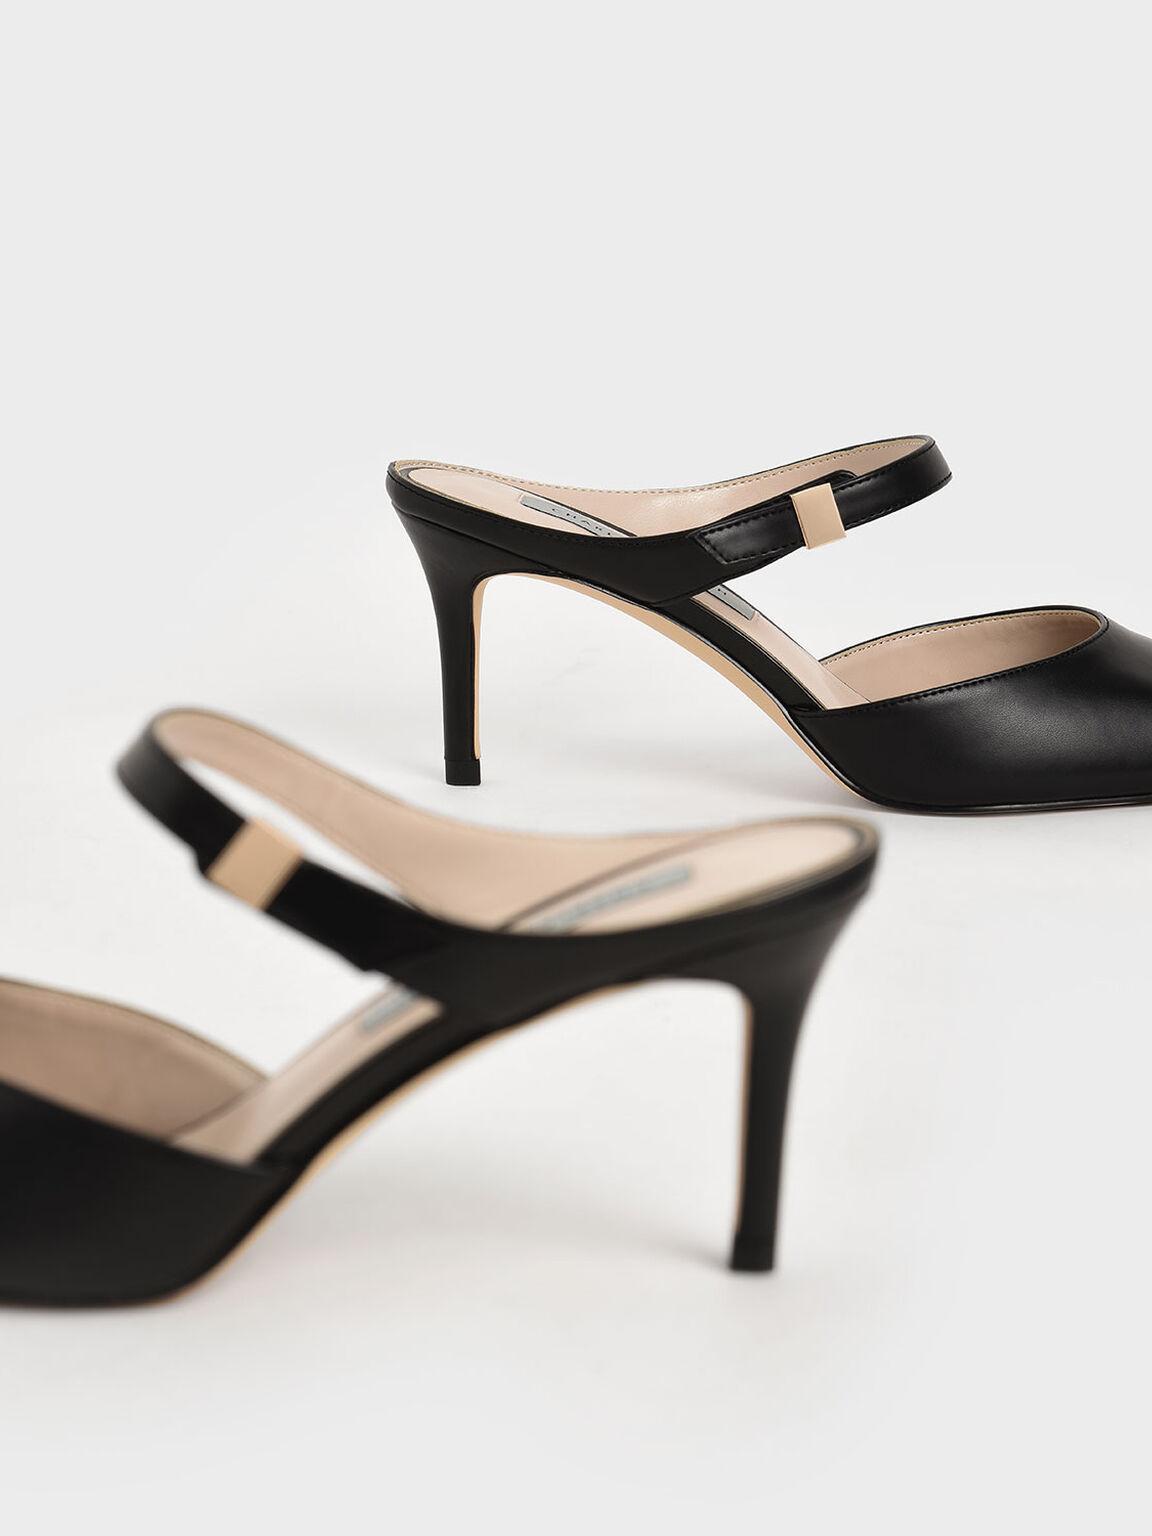 Ankle Strap Mules, Black, hi-res